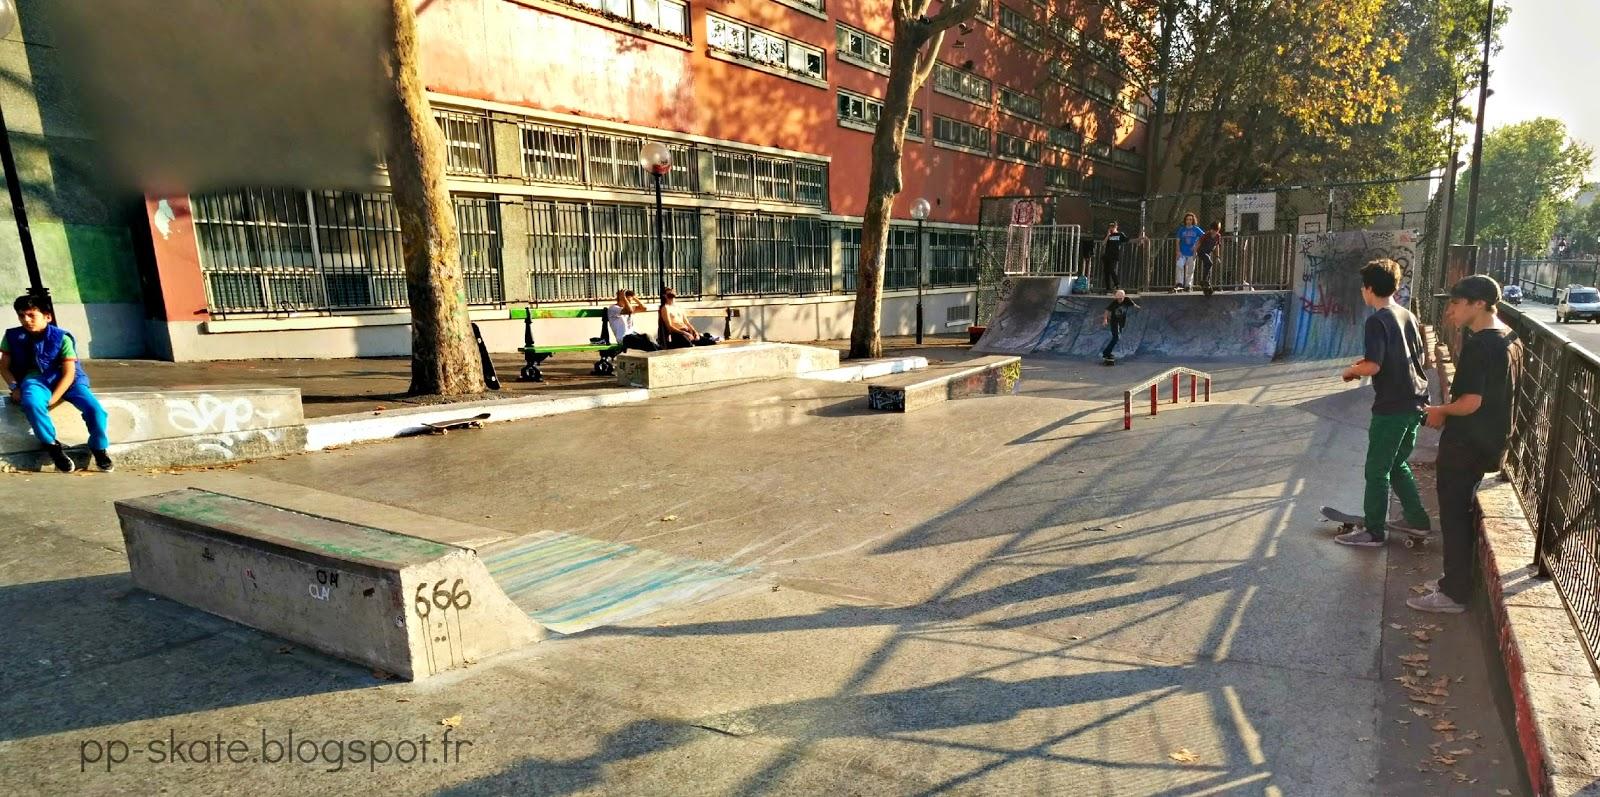 Skatepark Jemmapes nouveau